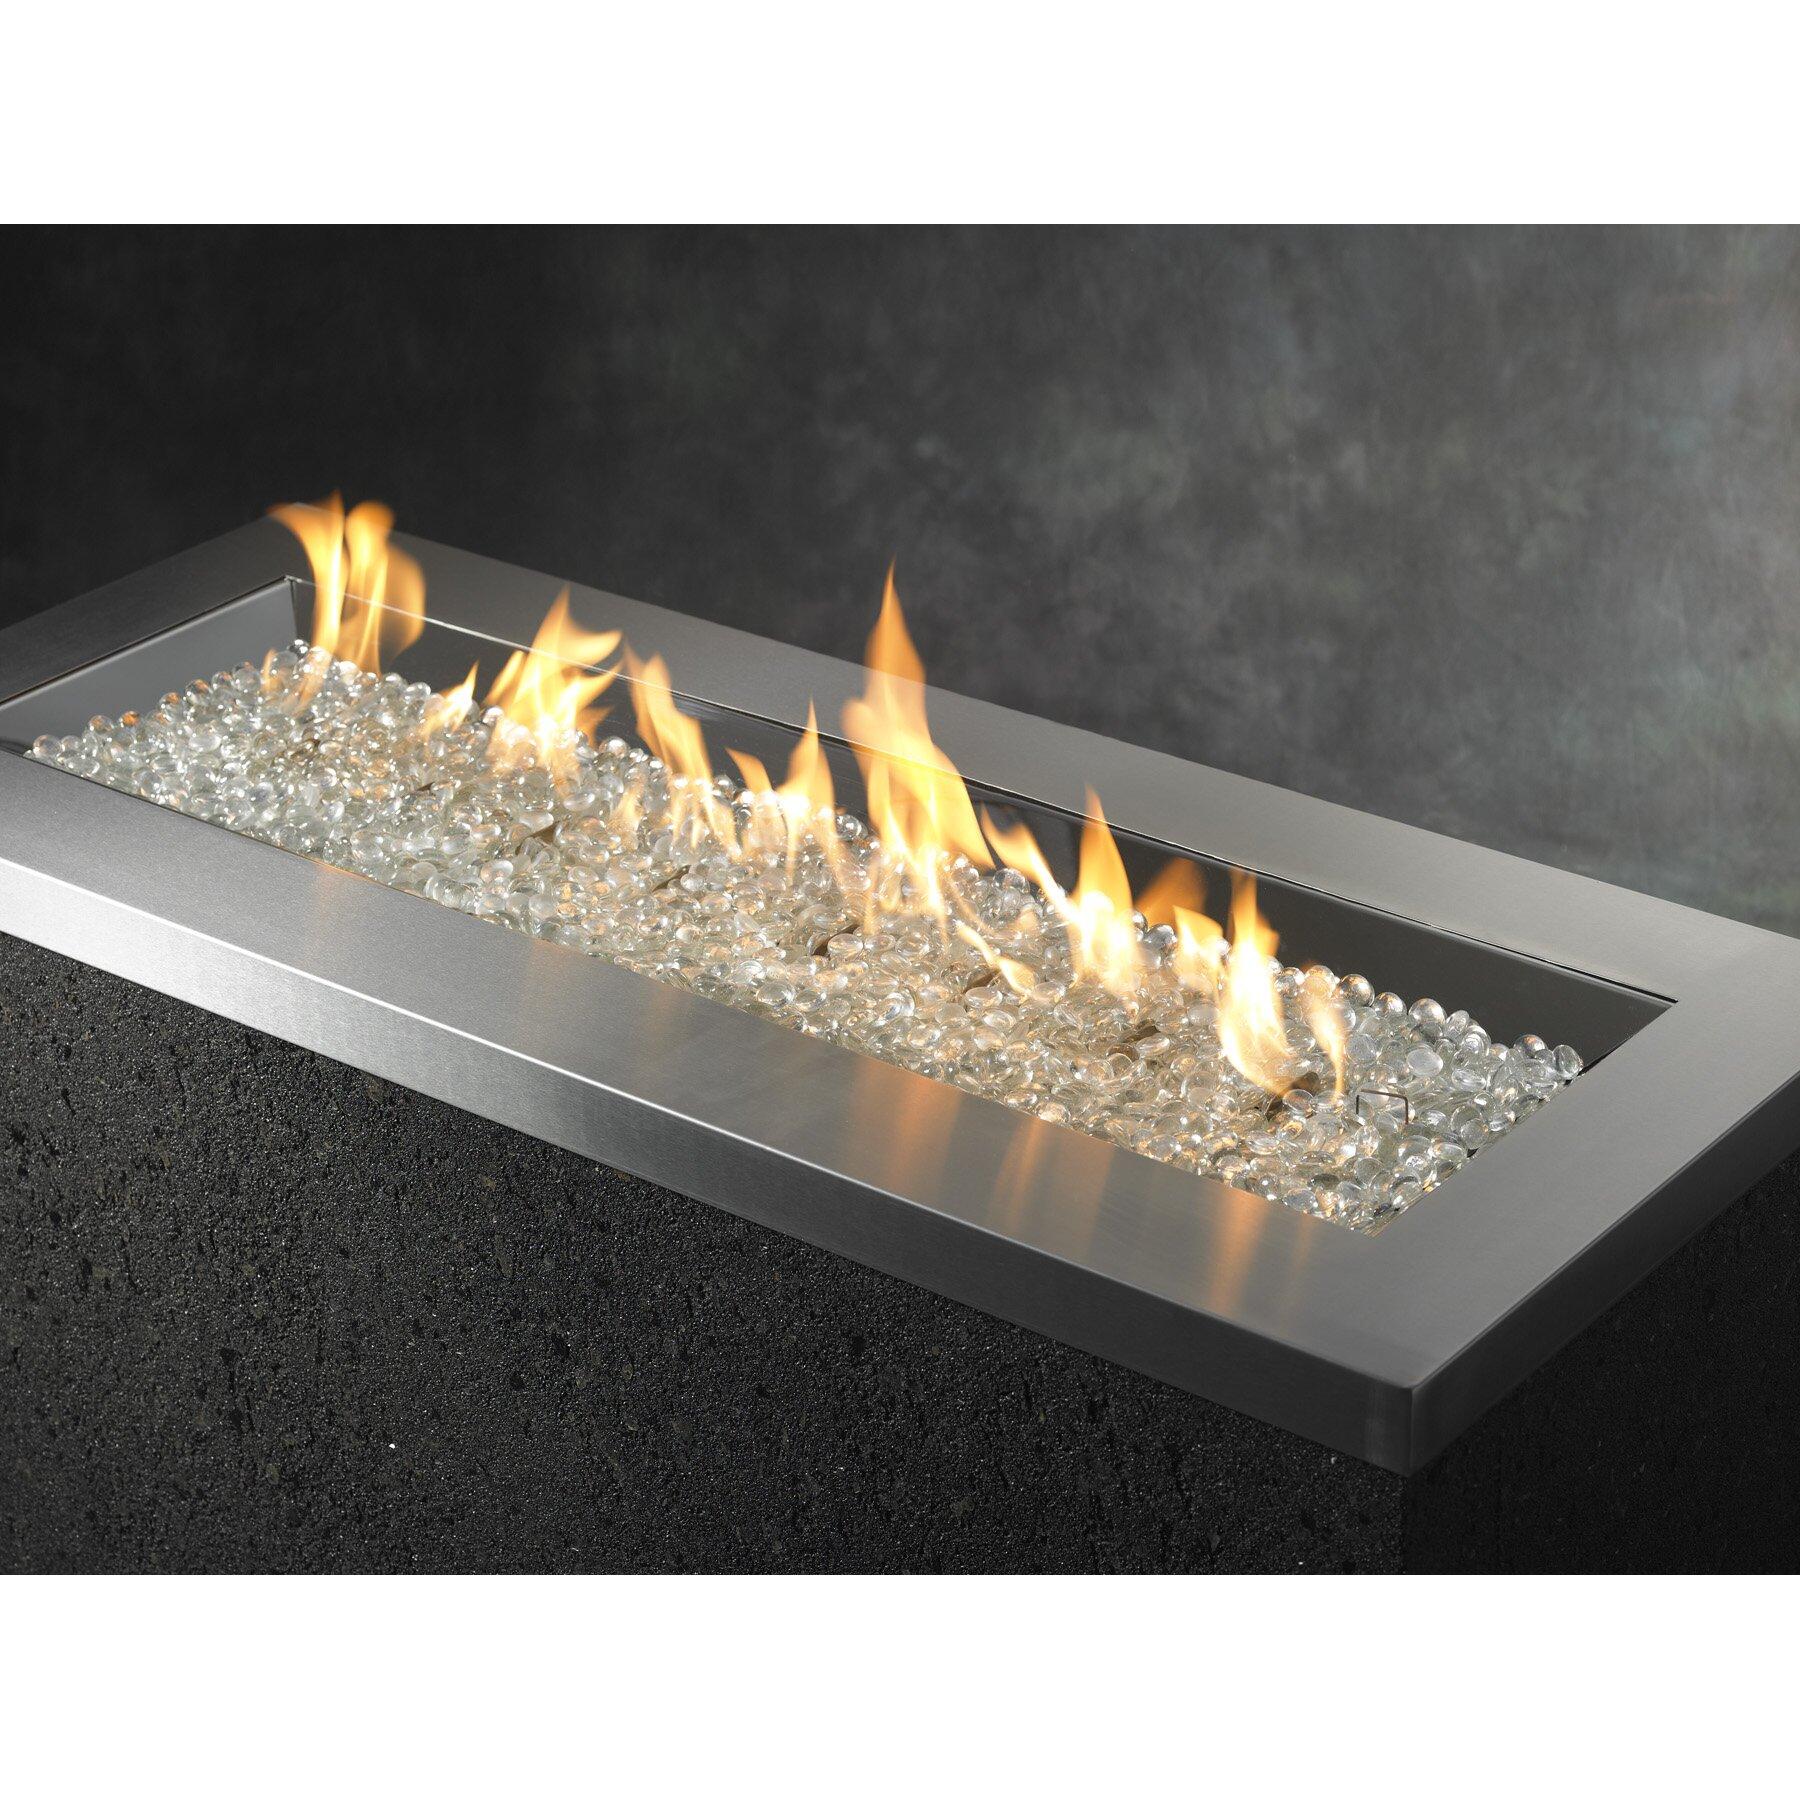 Crystal Fiberglass Propane And Natural Gas Fire Pit Wayfair